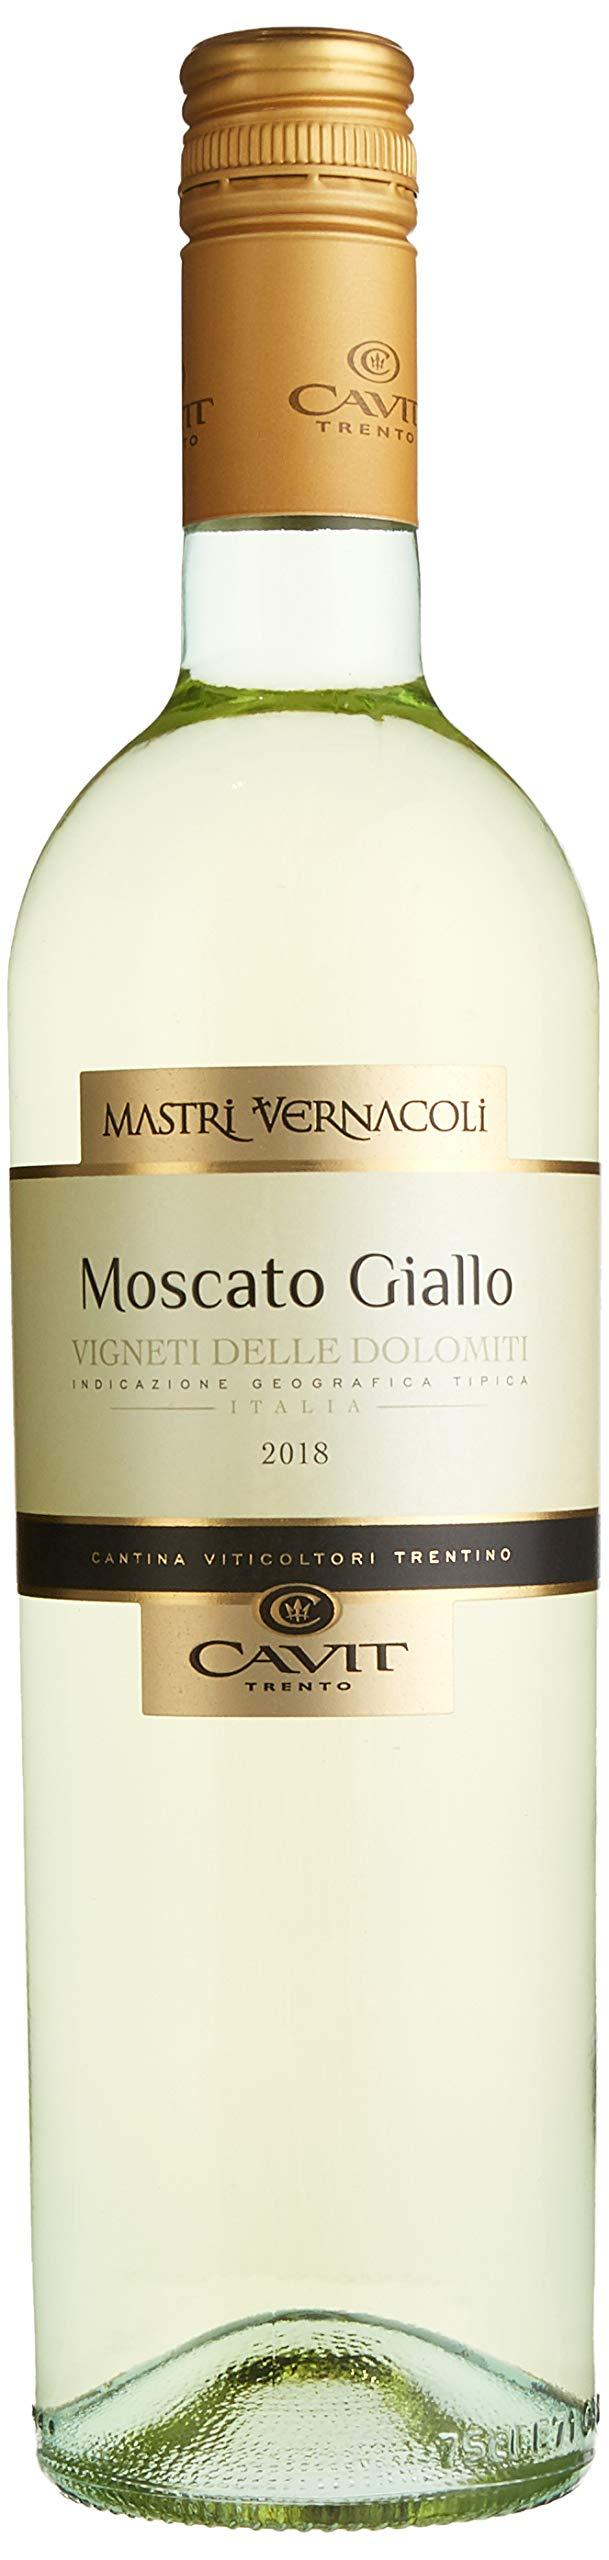 Moscato-Giallo-Vigneti-delle-Dolomiti-IGT-Goldmuskateller-trocken-6-x-075-l